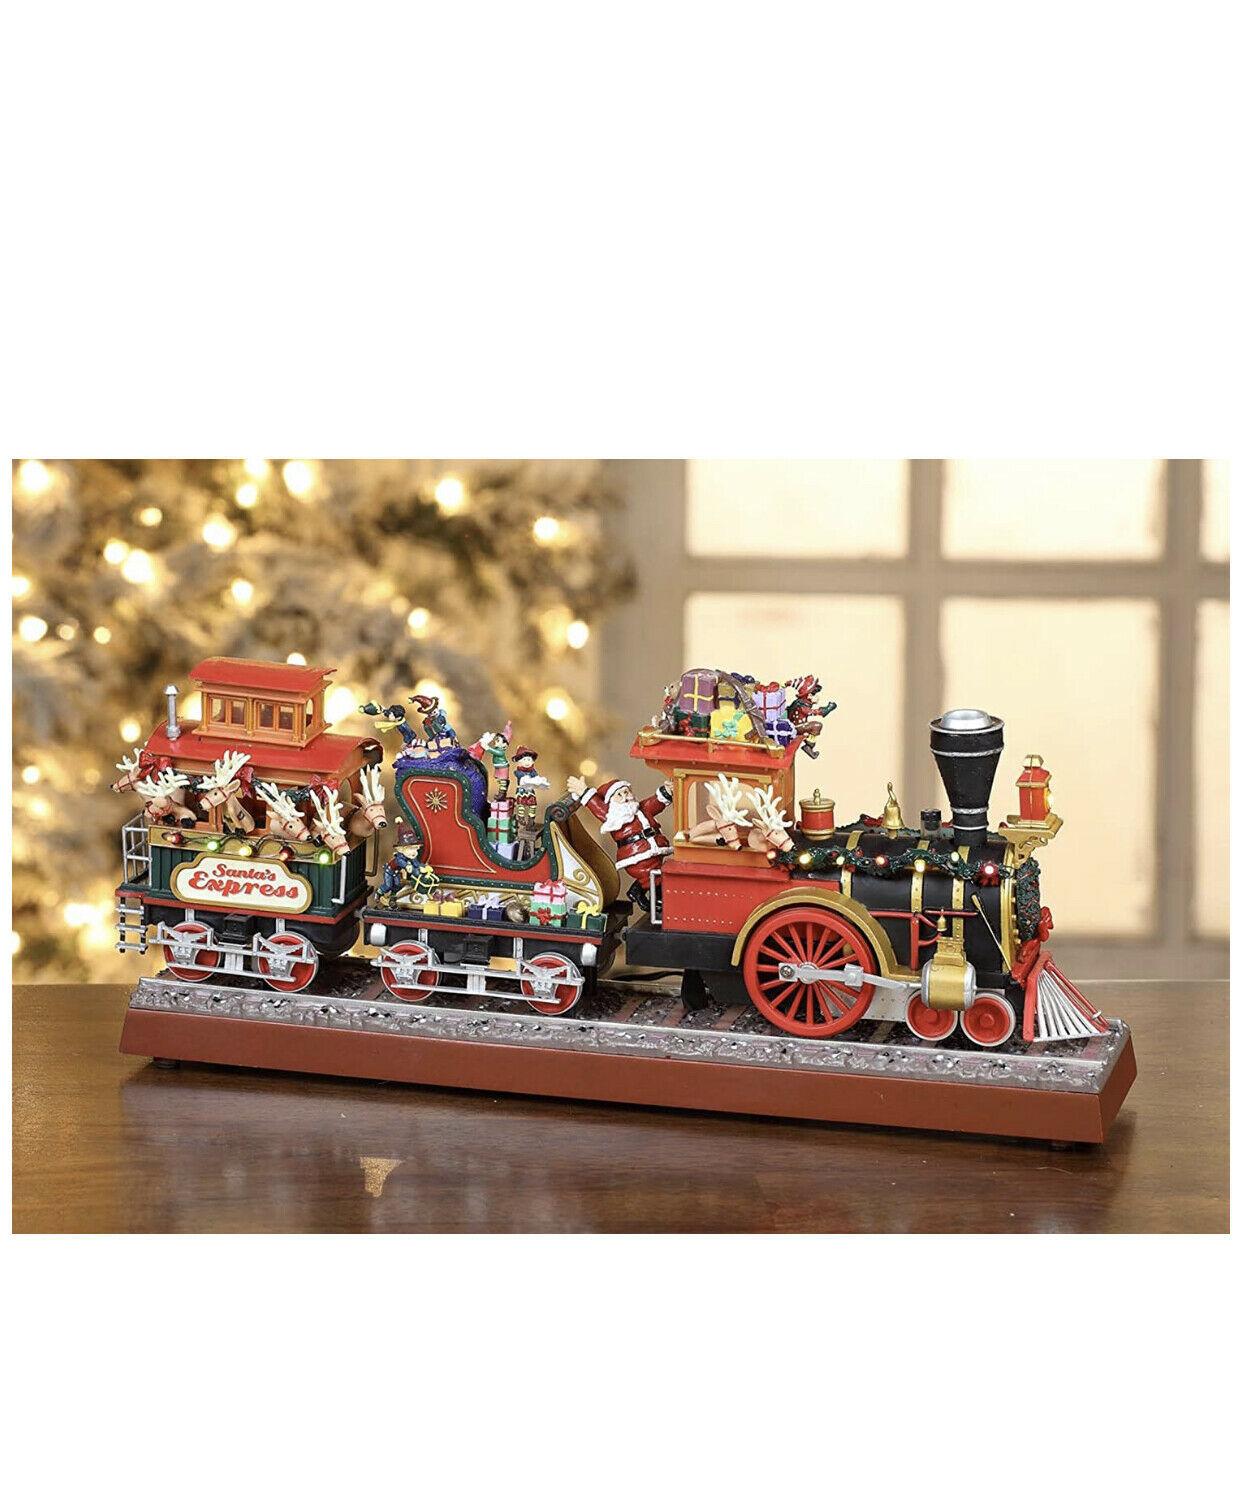 Mr. Christmas Animated Musical Santa's Express & Working Smokestack 20 songs (a) - $395.99